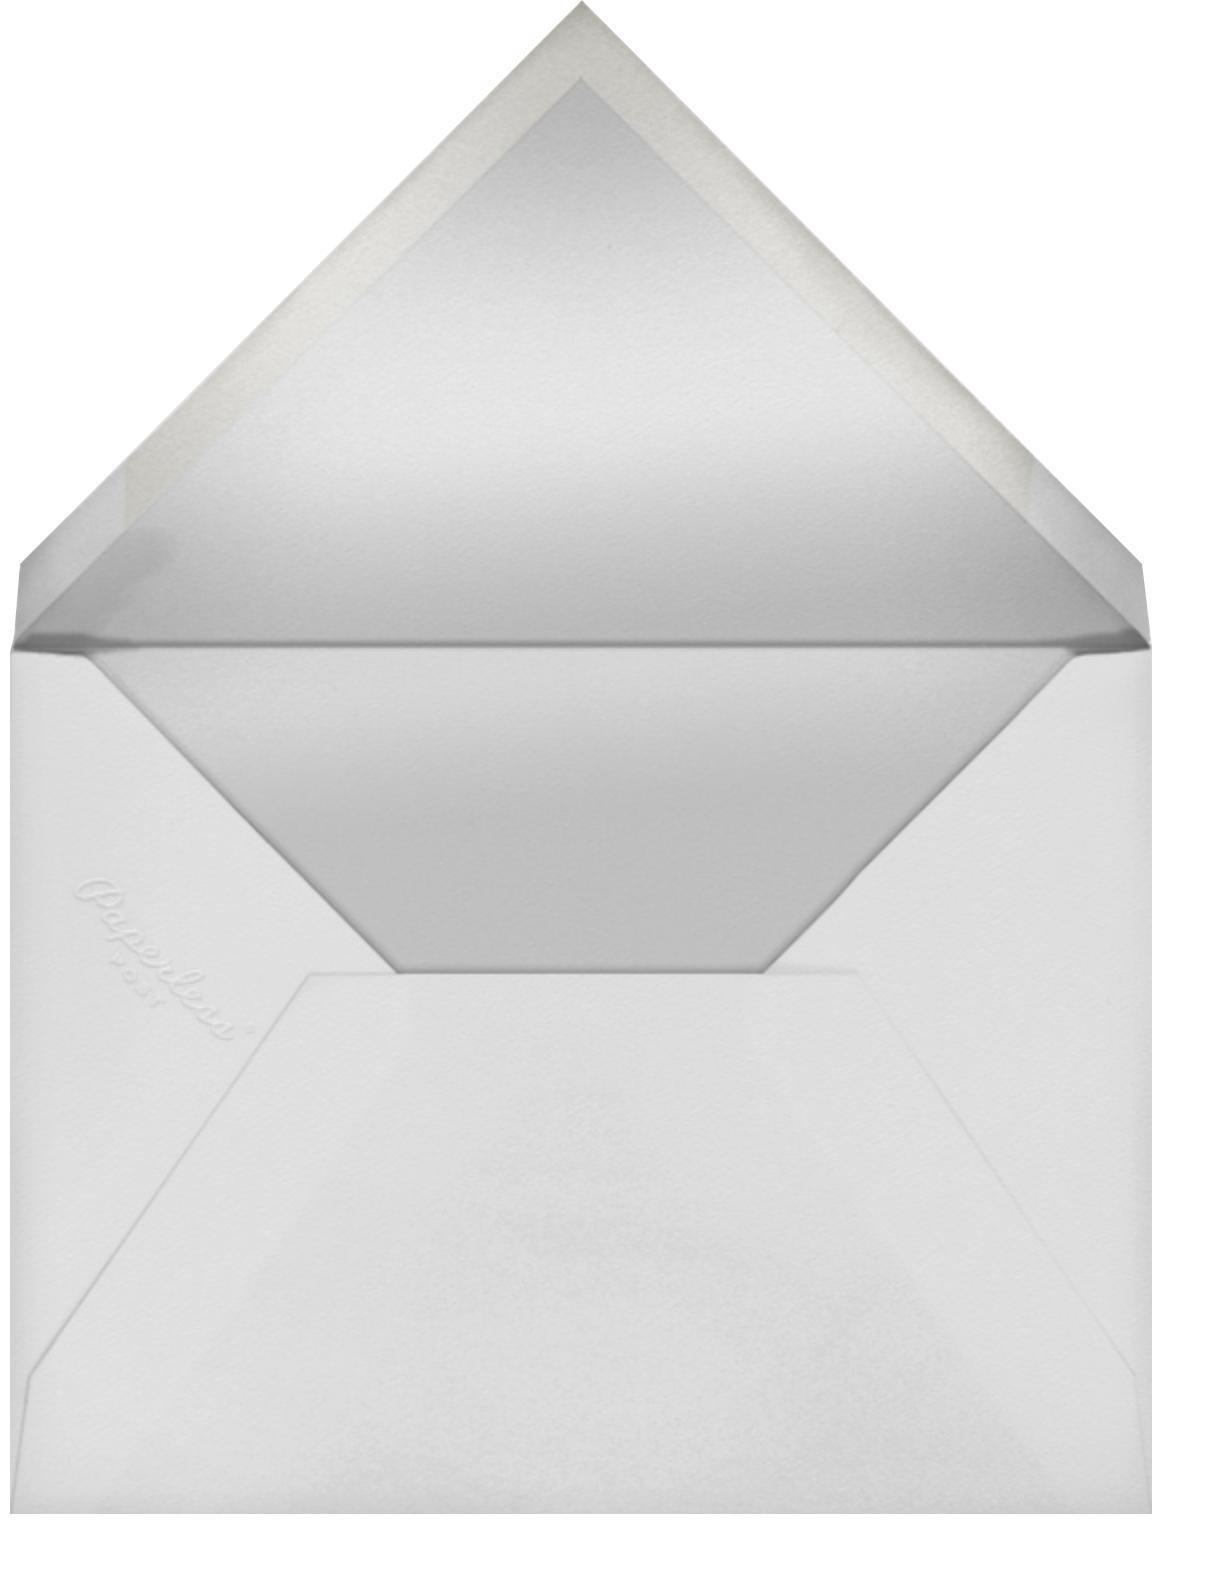 Snowflake Pattern - Ivory - Paperless Post - Hanukkah - envelope back